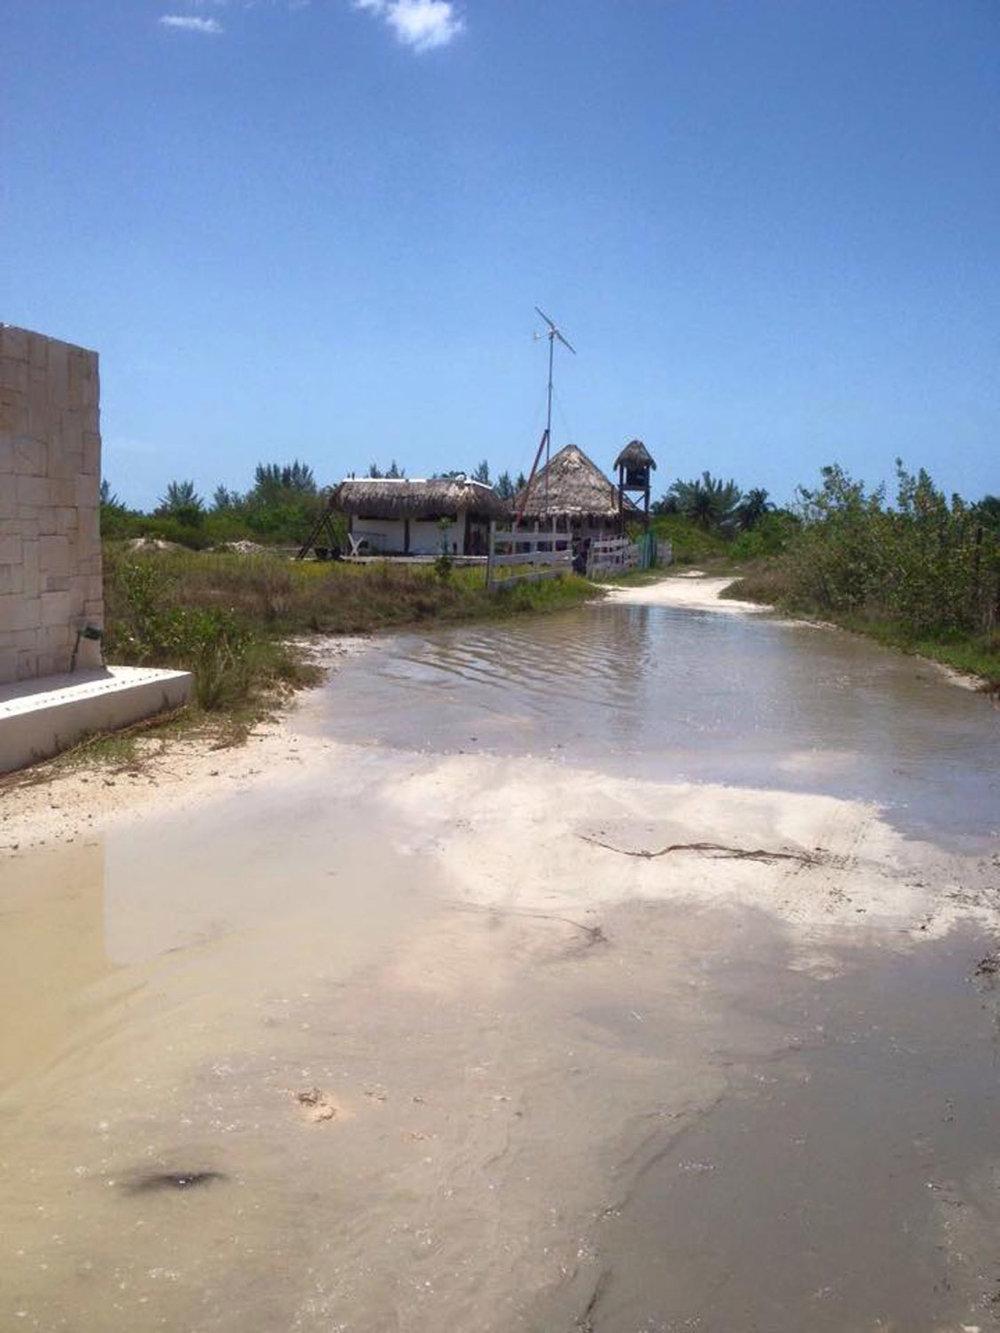 Hammocks_and_Ruins_Riviera_Maya_What_to_Do_Cancun_Playa_Del_Carmen_Islands_Isla_Holbox_35.jpg